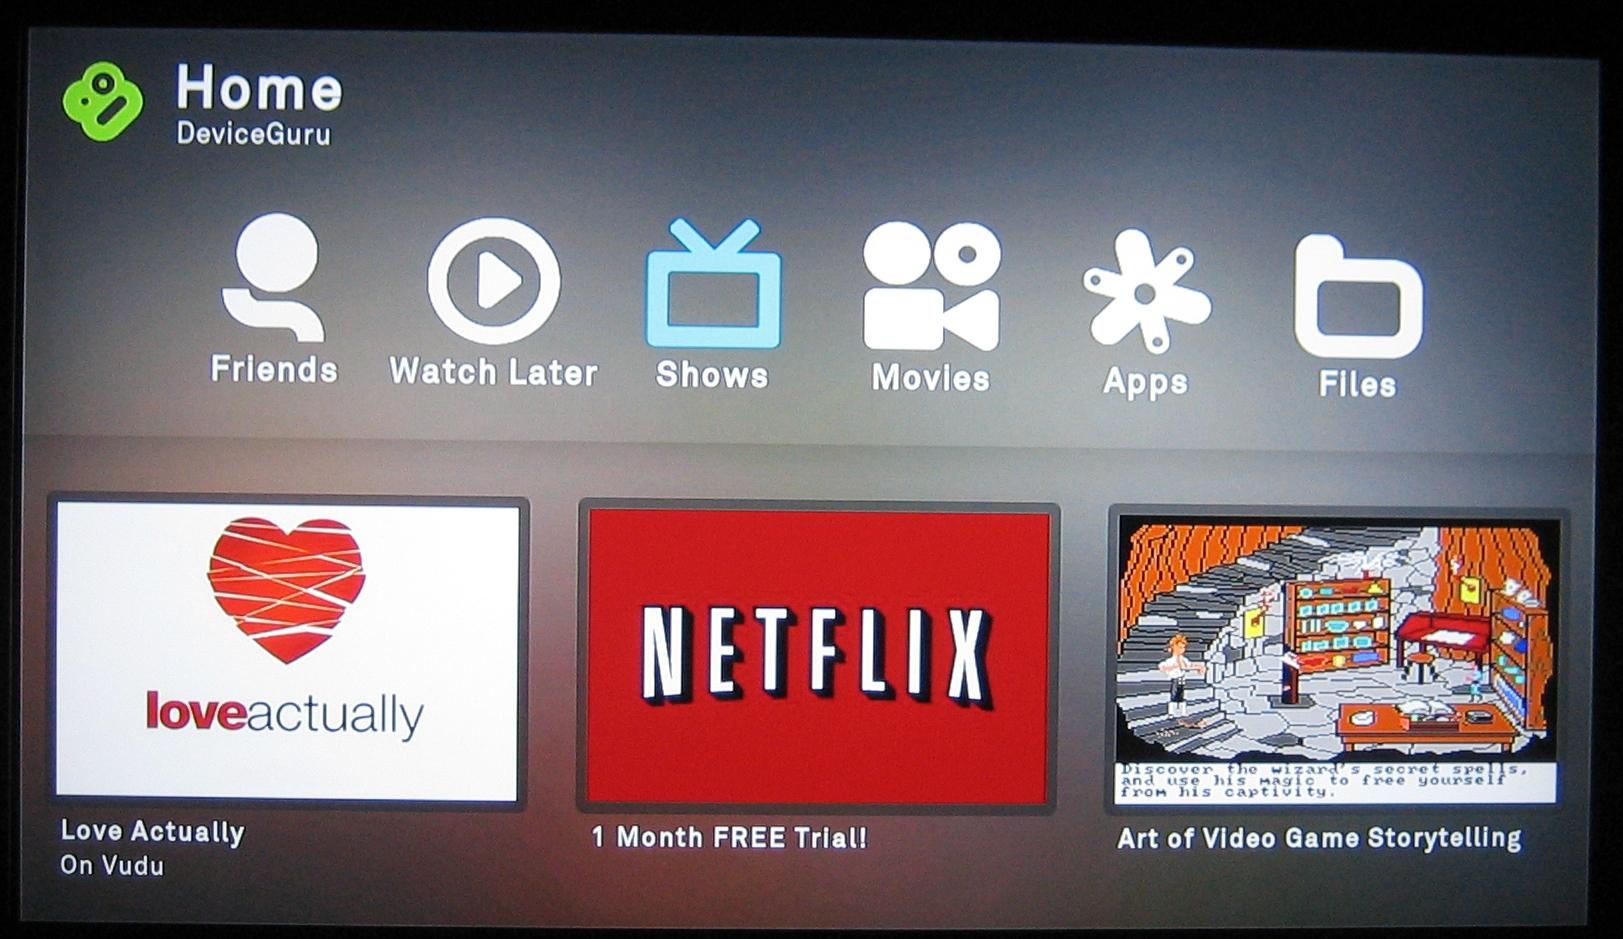 Netflix finally on Boxee Box, but buggy - DeviceGuru